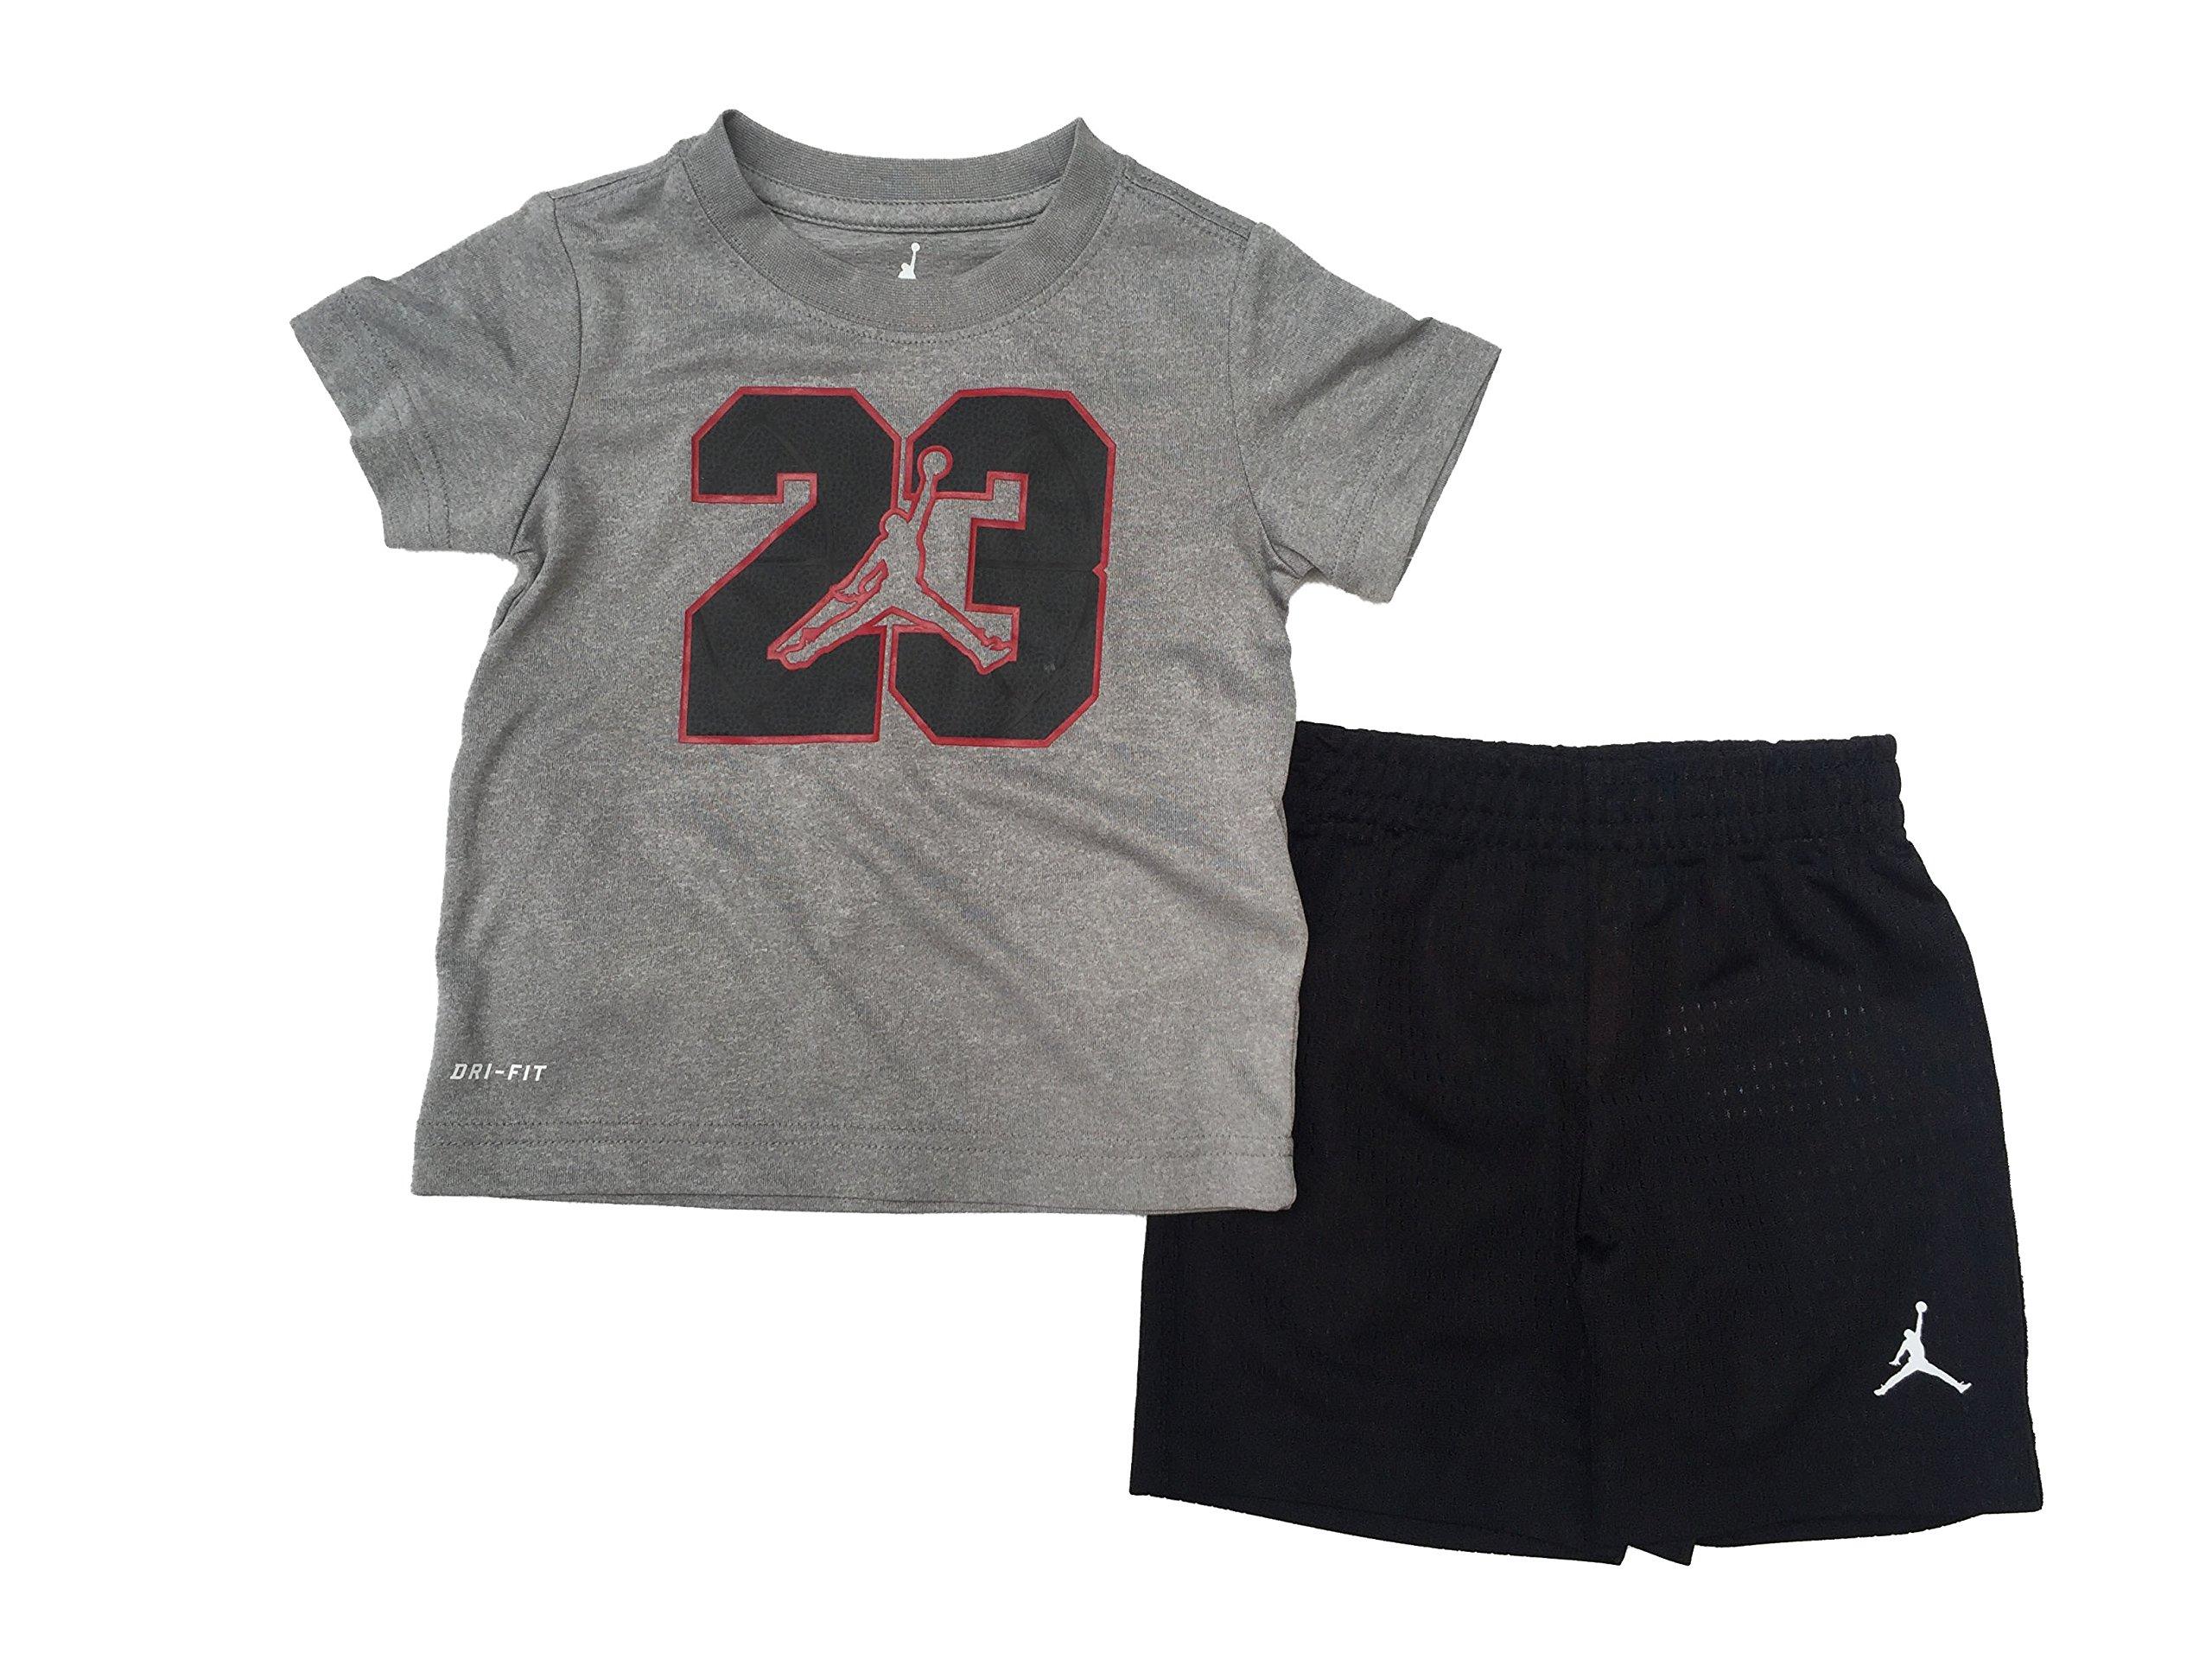 Jordan Jumpman 23 Logo Toddler Boys T-Shirt and Shorts Set Black/Dark Grey Heather Size 2T